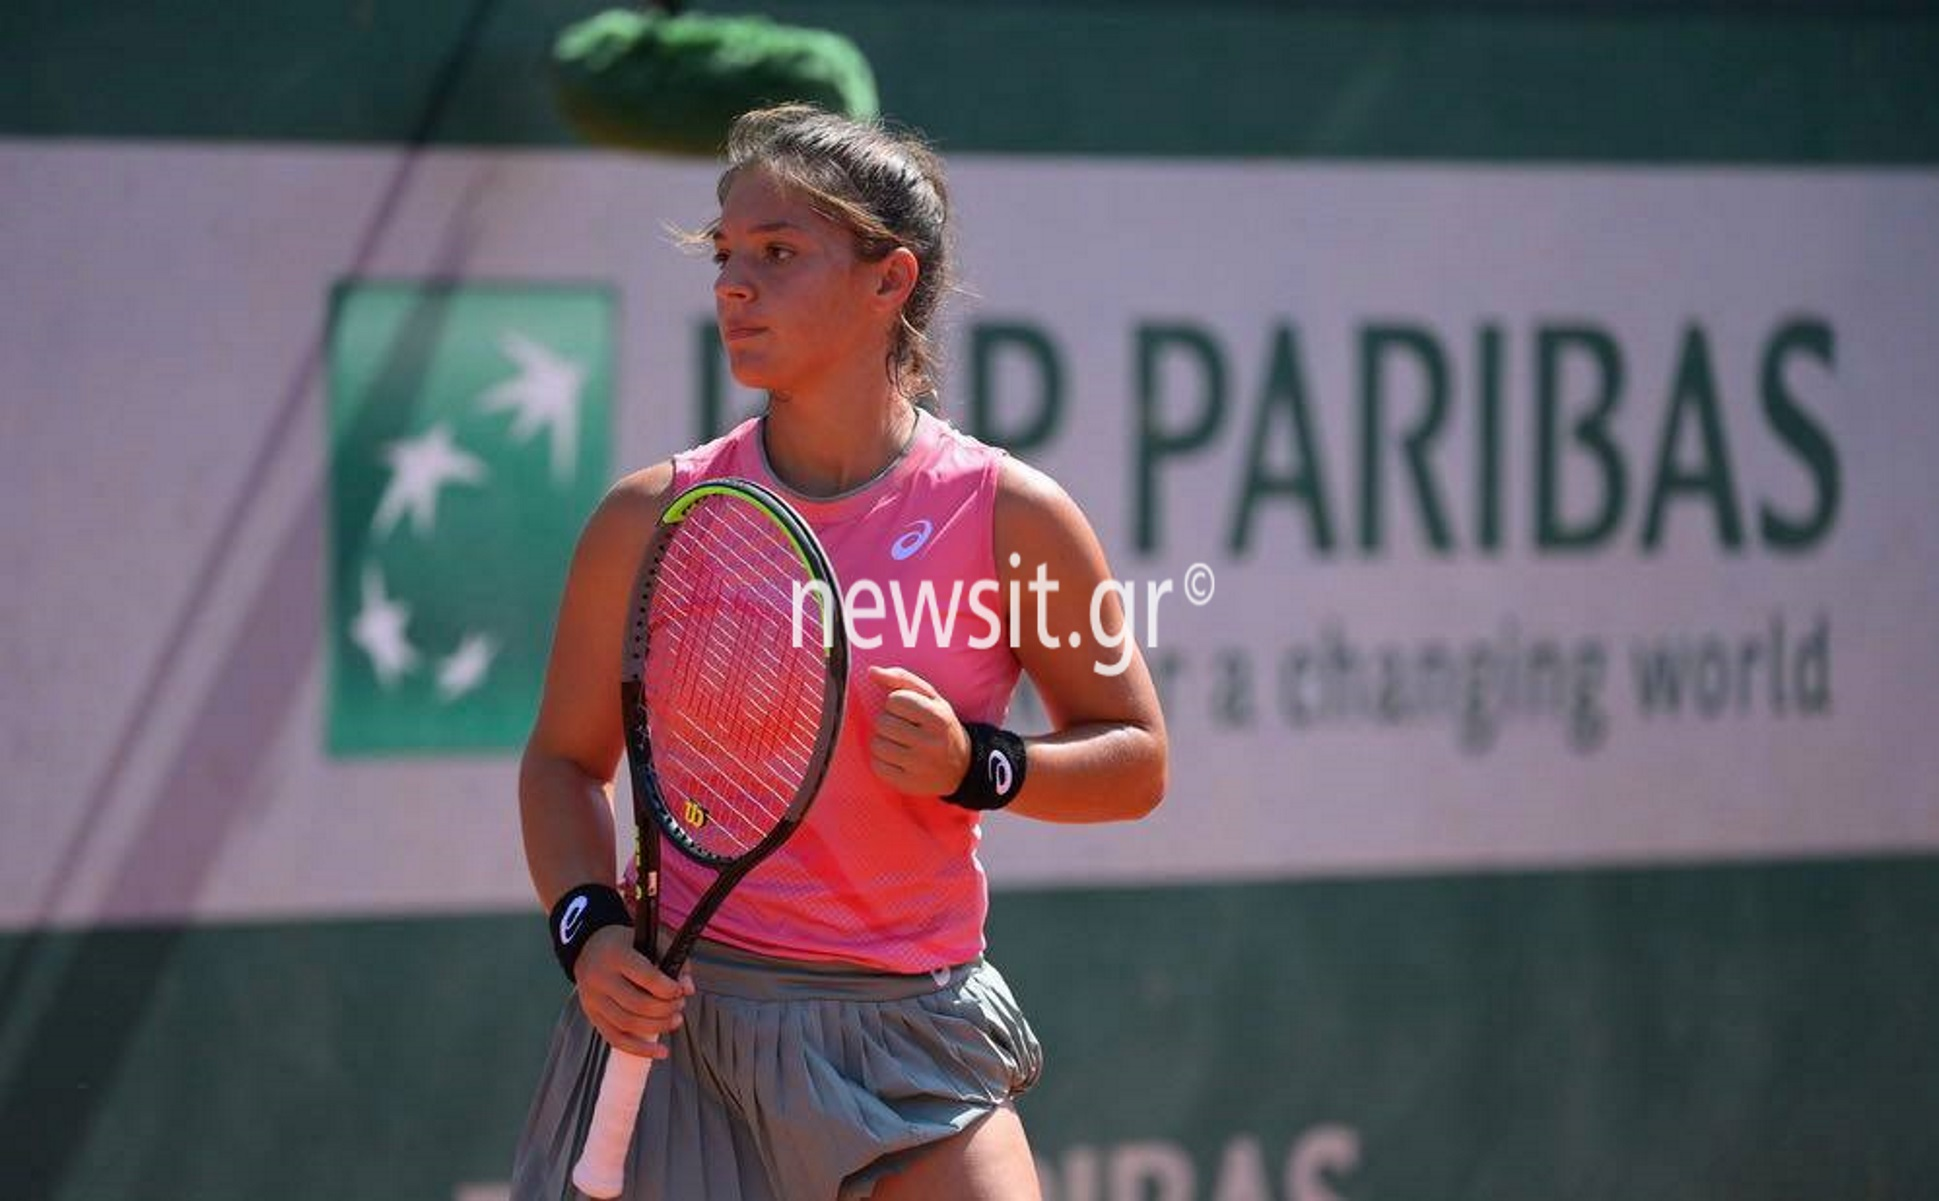 Roland Garros – Μιχαέλα Λάκη: Η νεαρή Λαρισαία που έφτασε στους «16» και ο Τσιτσιπάς (pics)